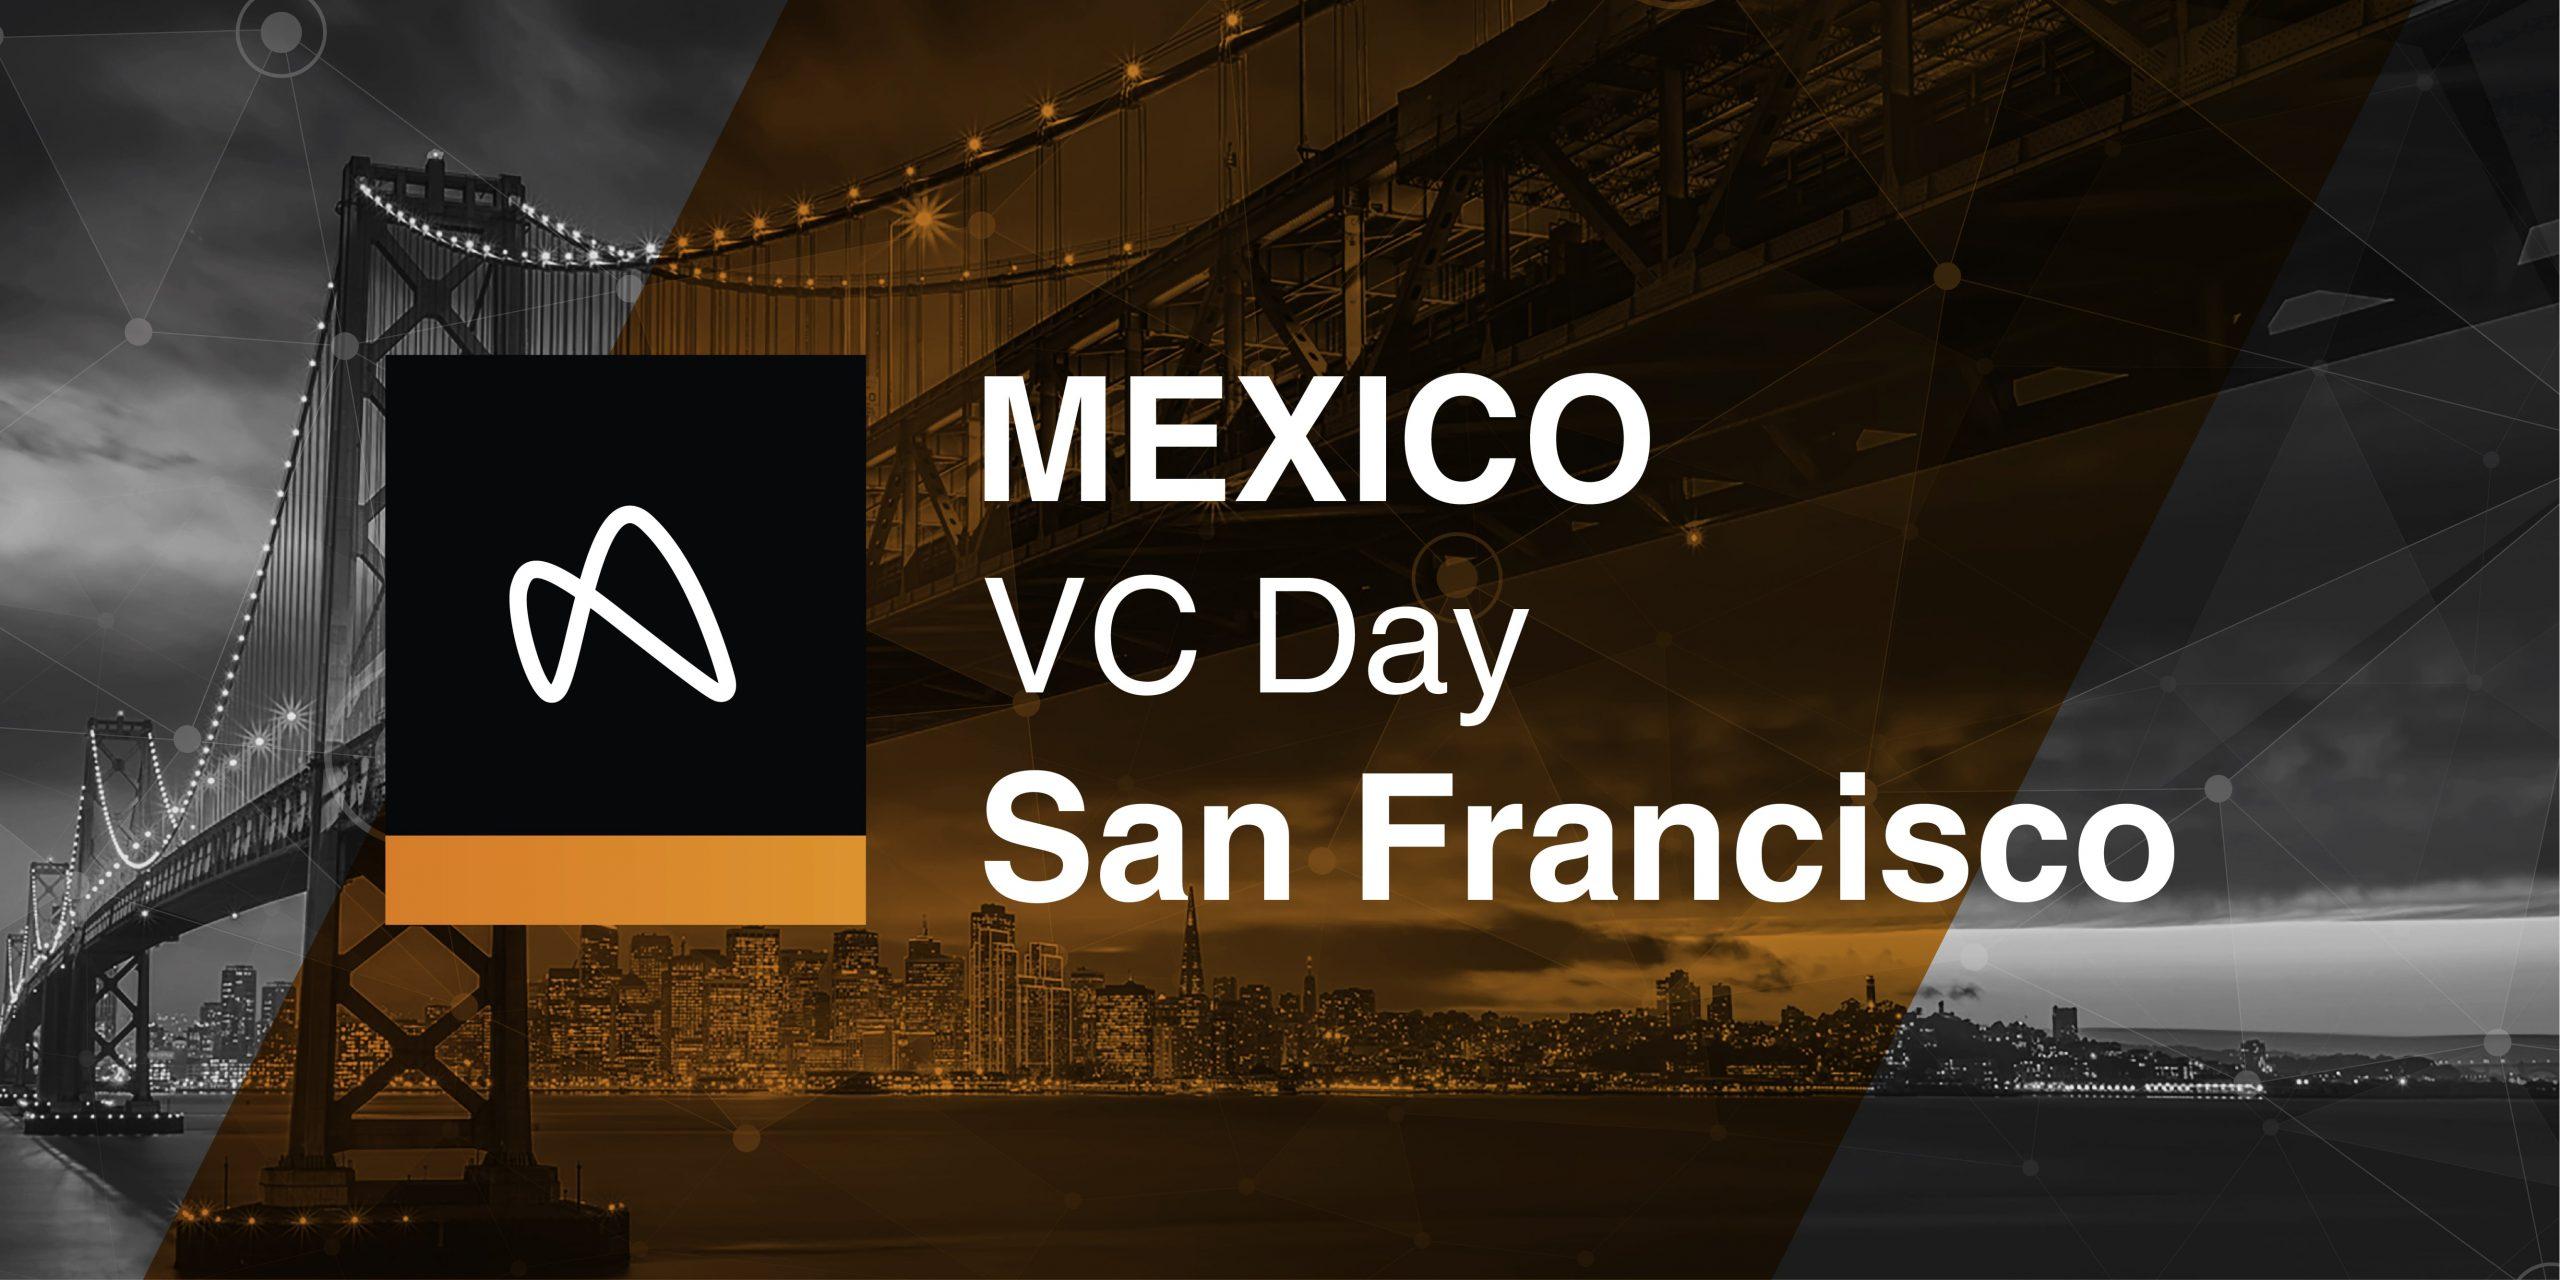 Mexico VC Day San Francisco